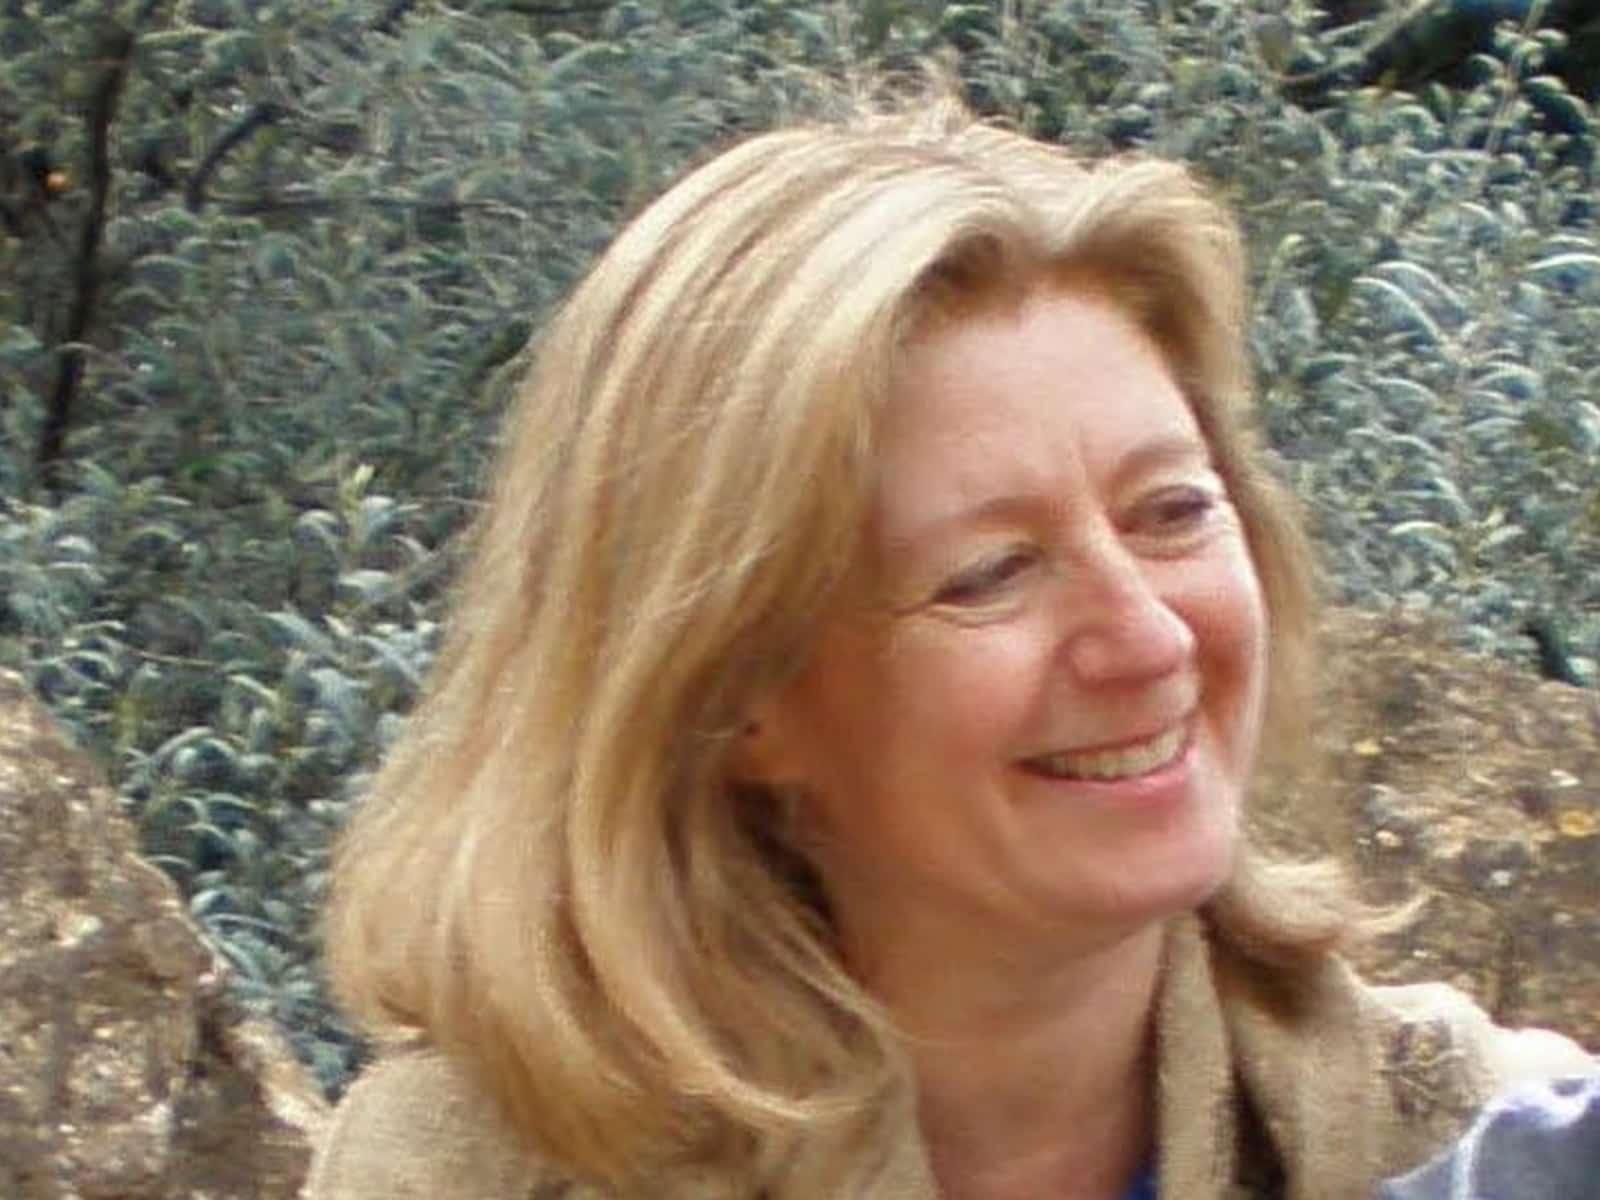 Jane from Oxford, United Kingdom